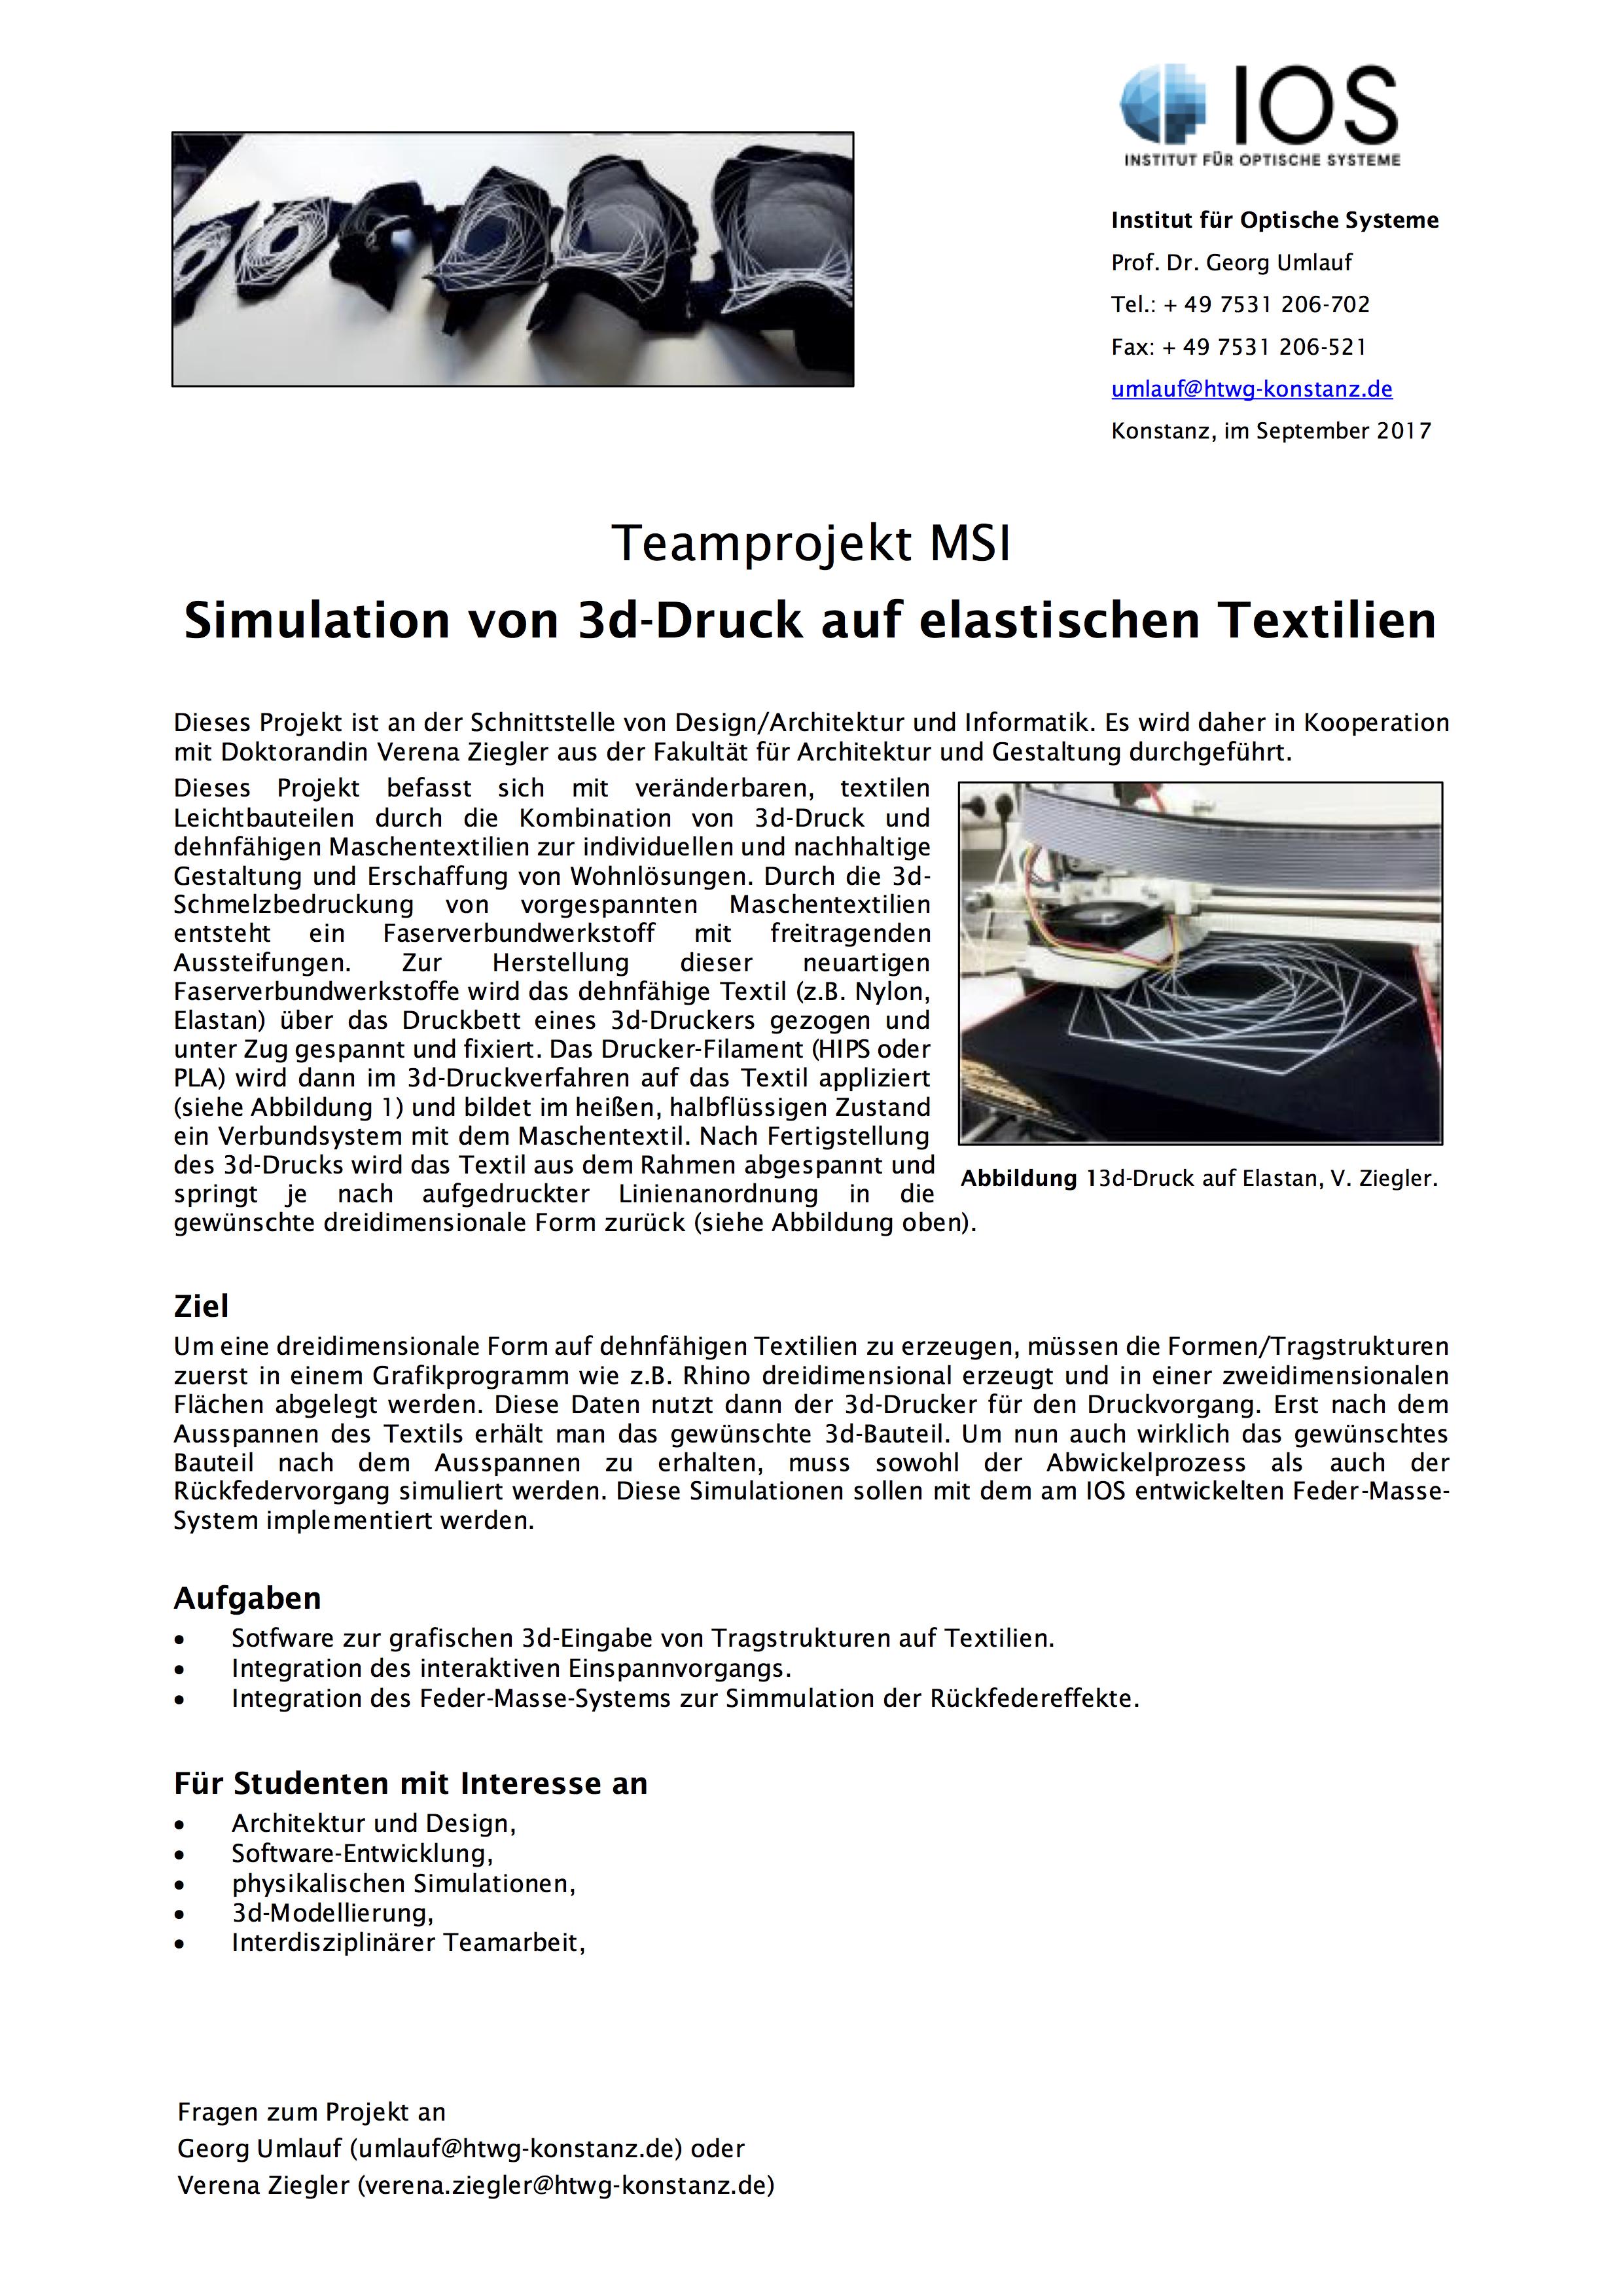 Teamprojekt_Sim3dDruck copy.jpg